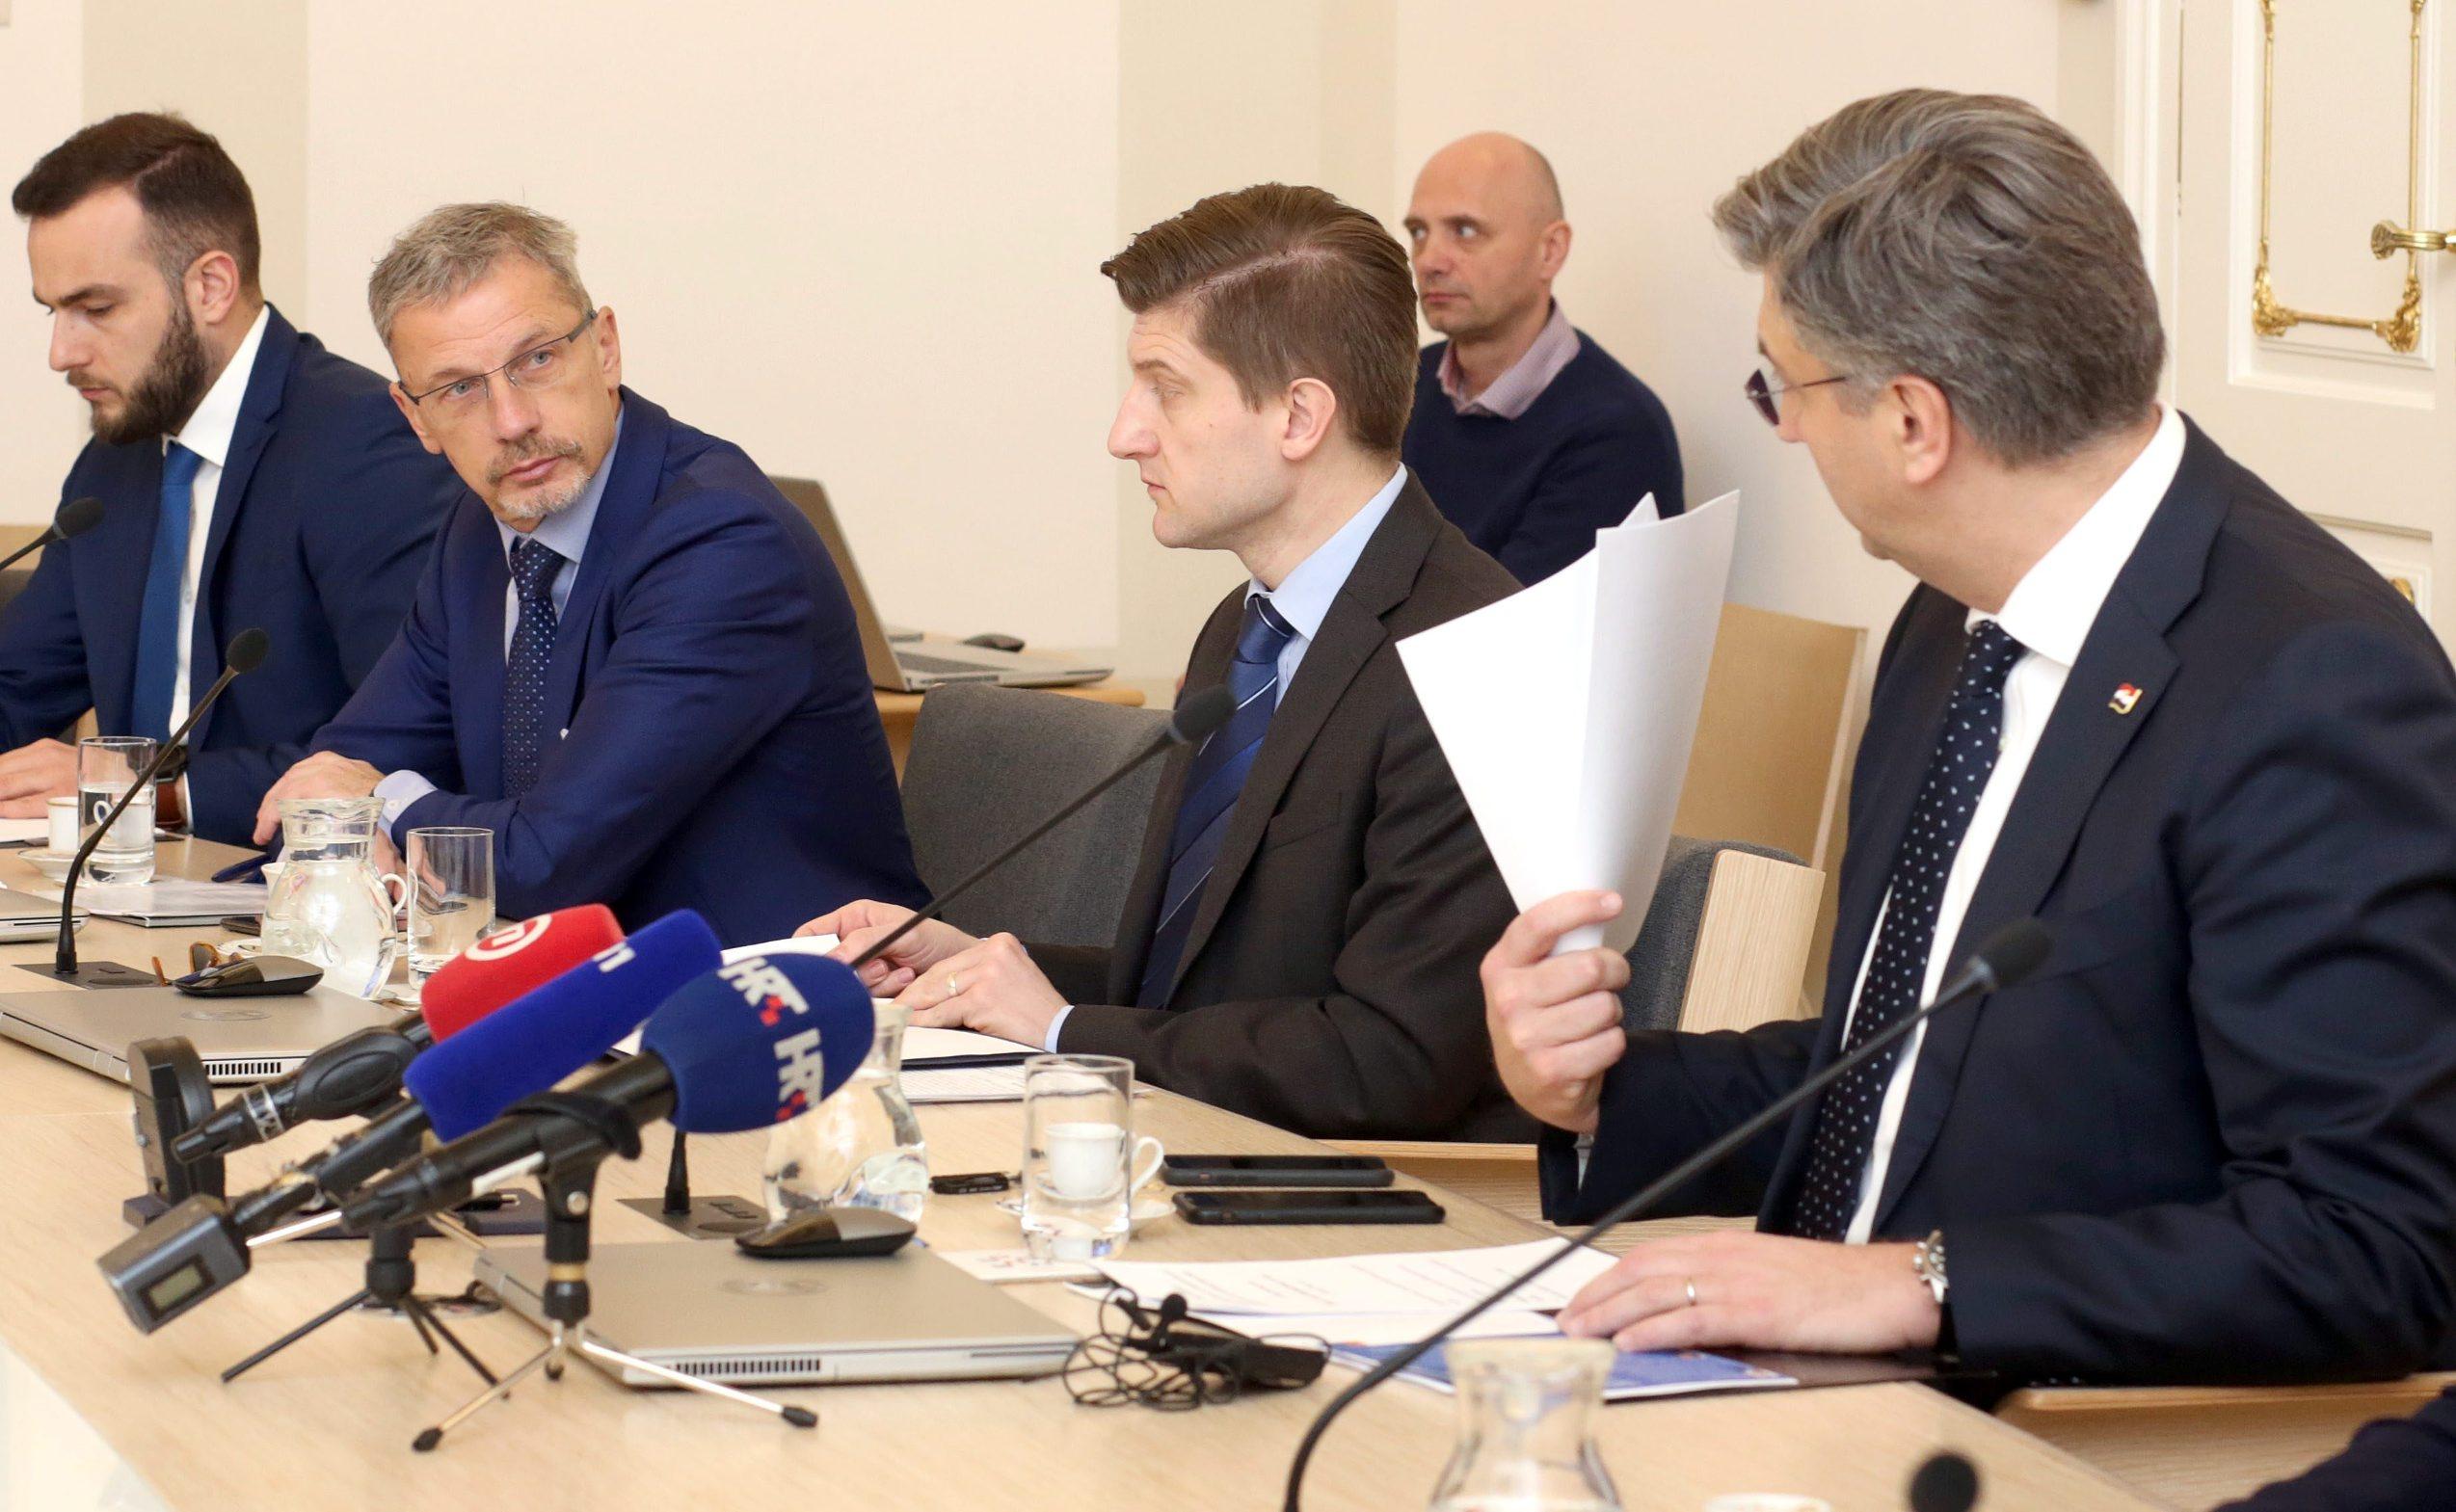 Guverner Hrvatske narodne banke Boris Vujčić, ministar financija  Zdravko Marić i premijer Andrej Plenković